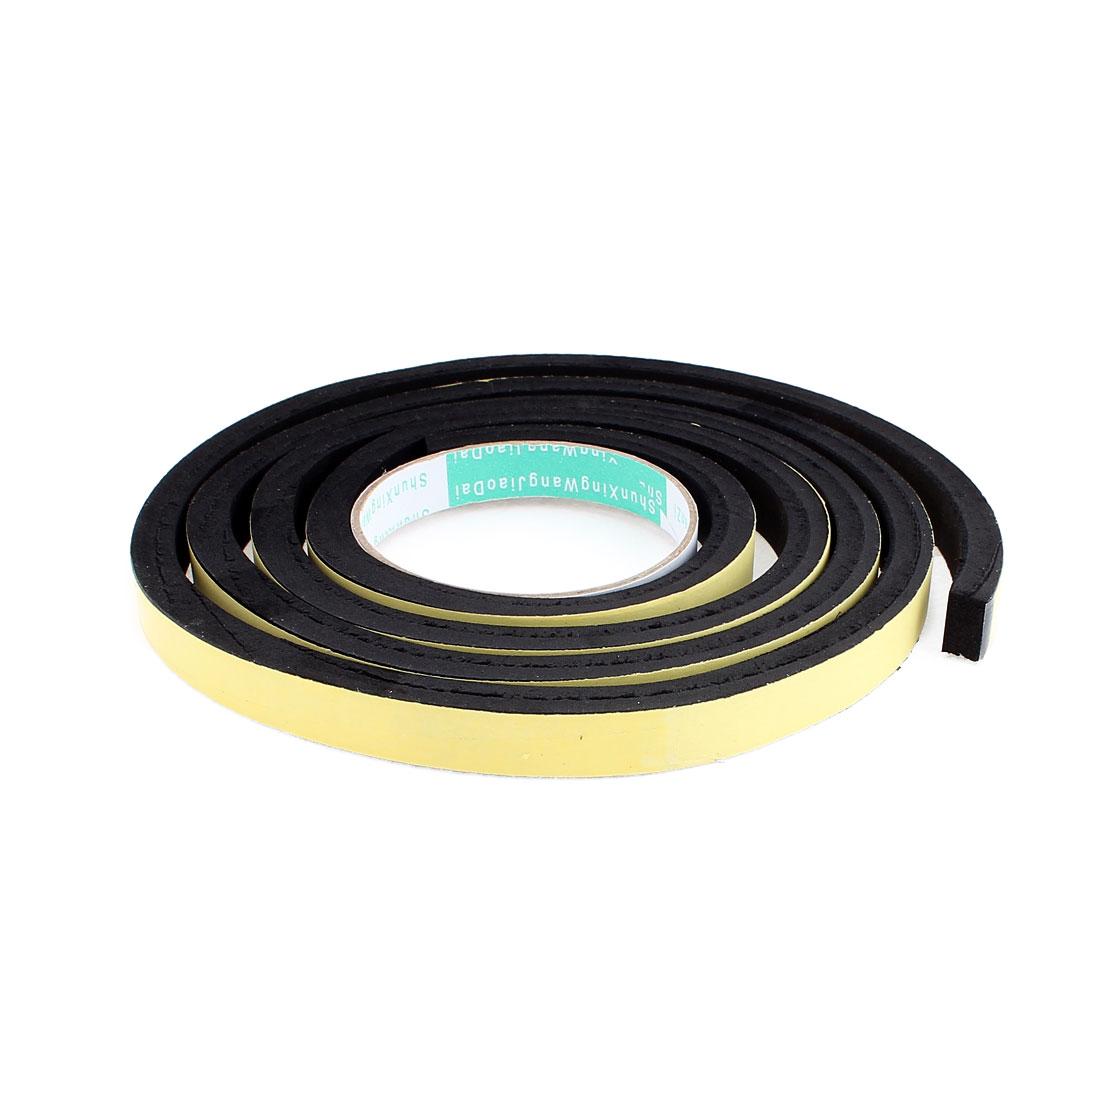 2 Meters 15mm x 10mm Single Side Adhesive EVA Foam Sealing Tap